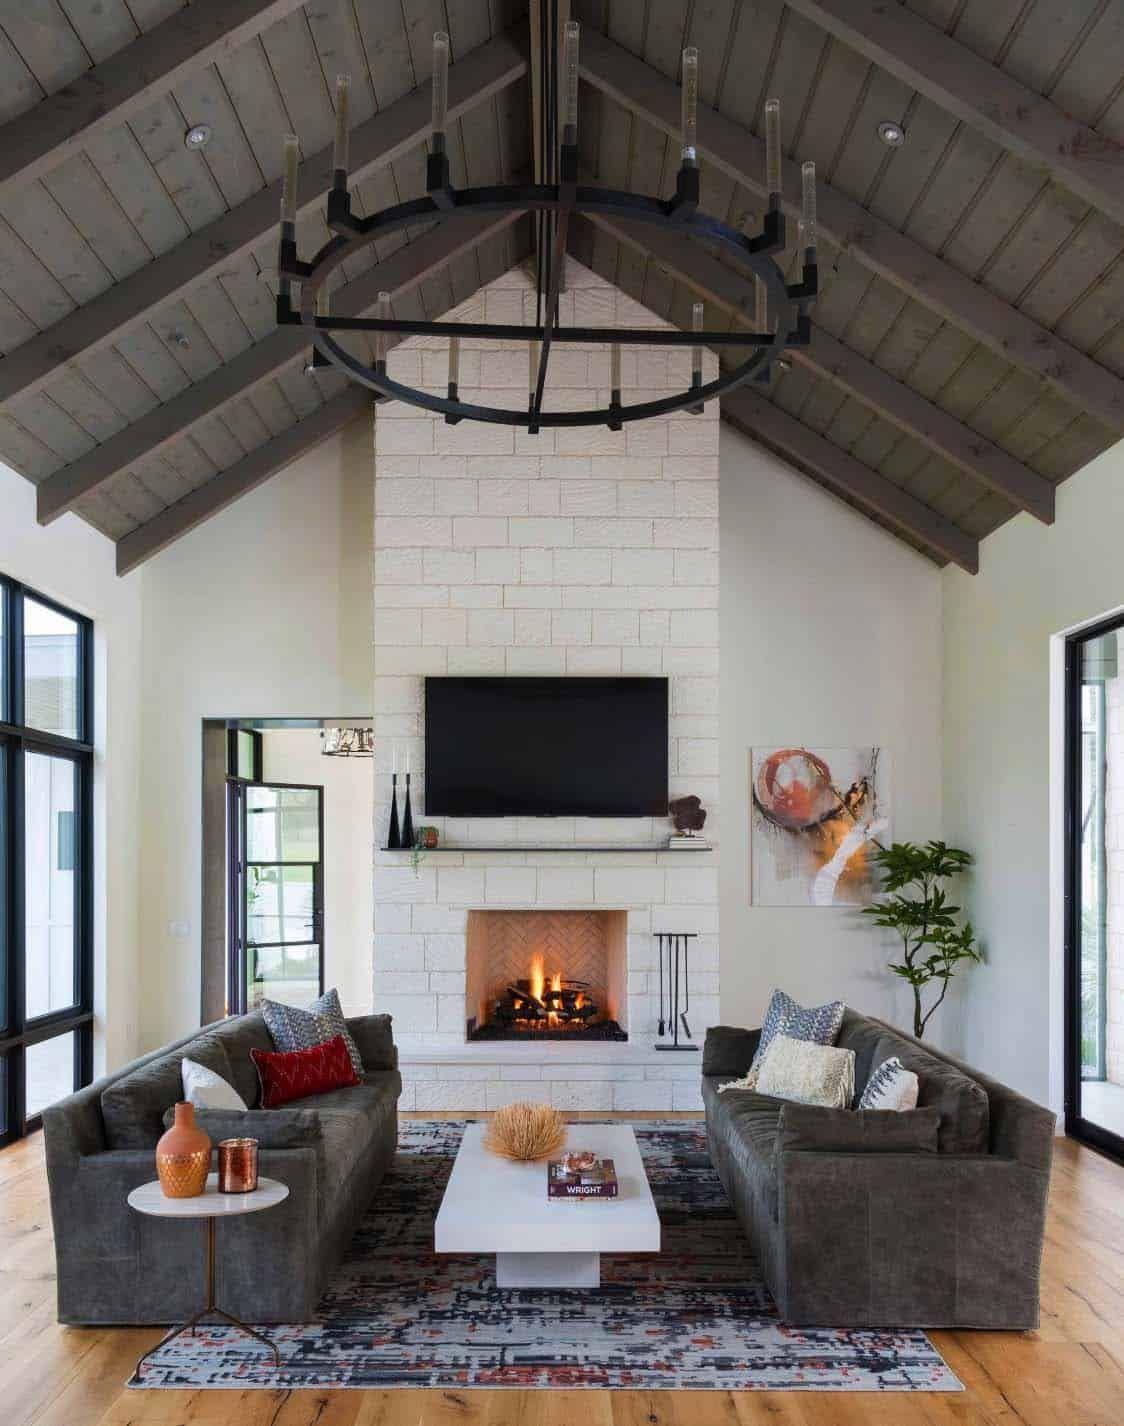 Modern farmhouse style in Texas showcases fantastic design inspiration #modernfarmhousestyle